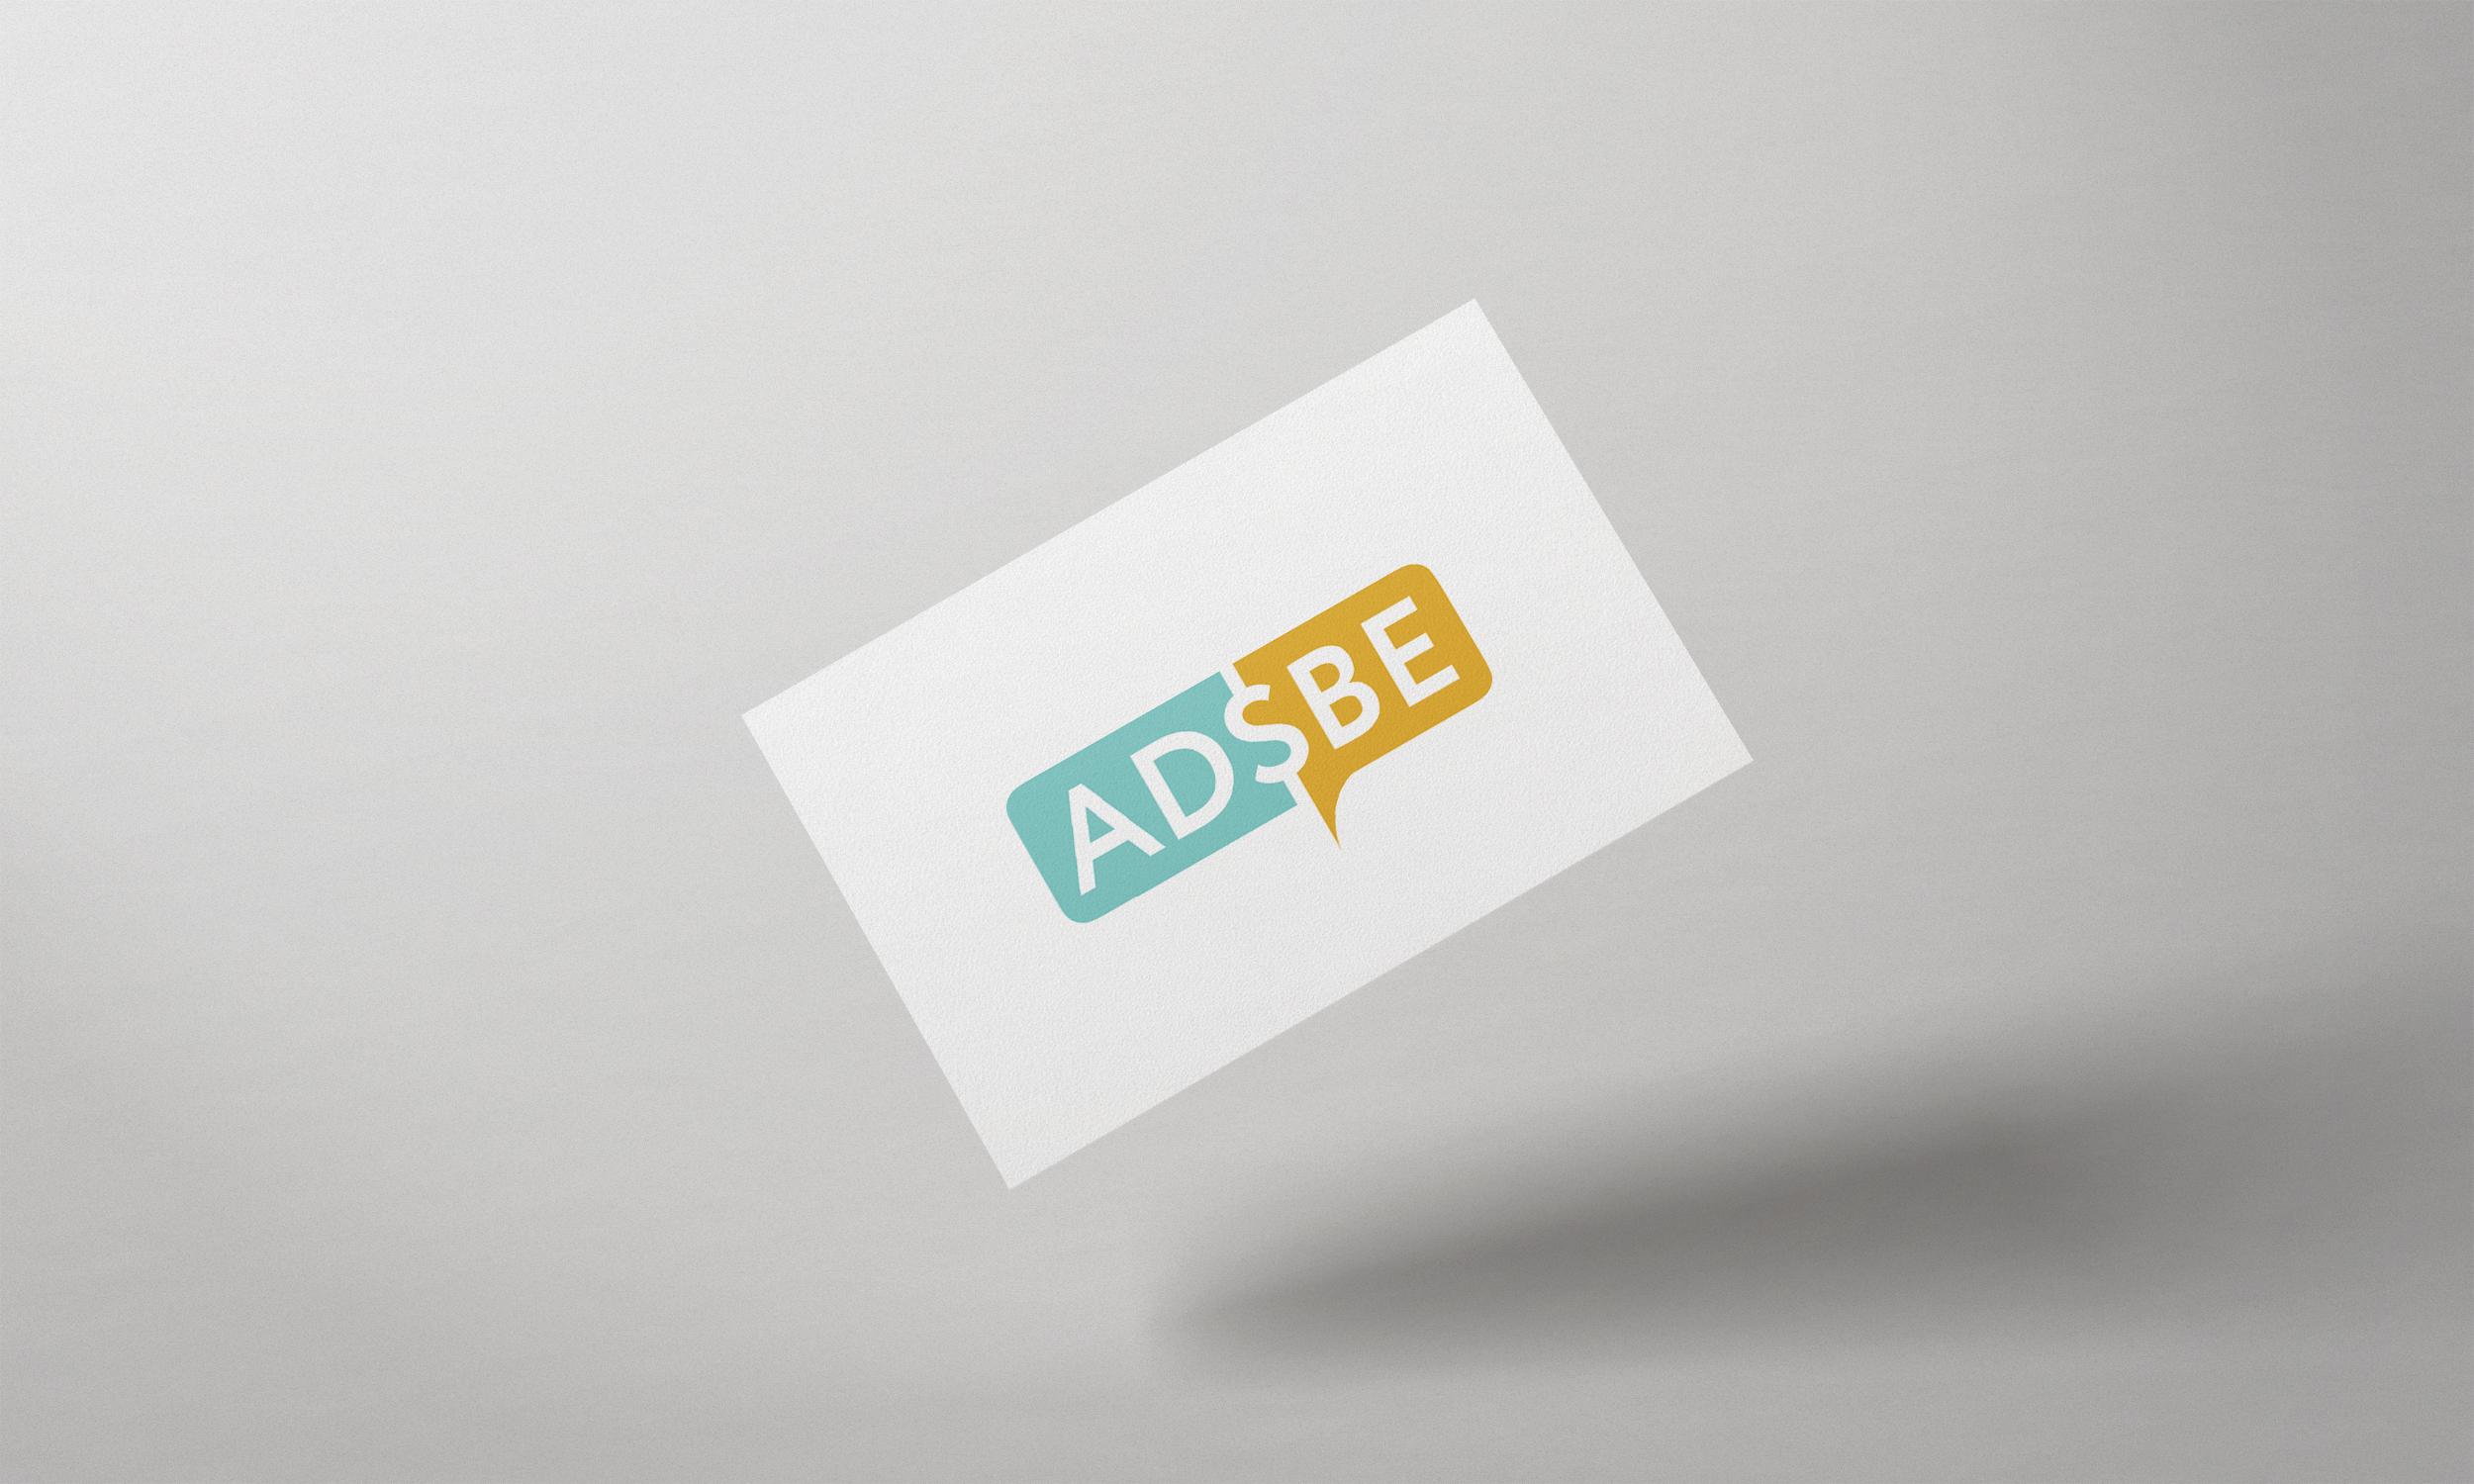 ADSBE